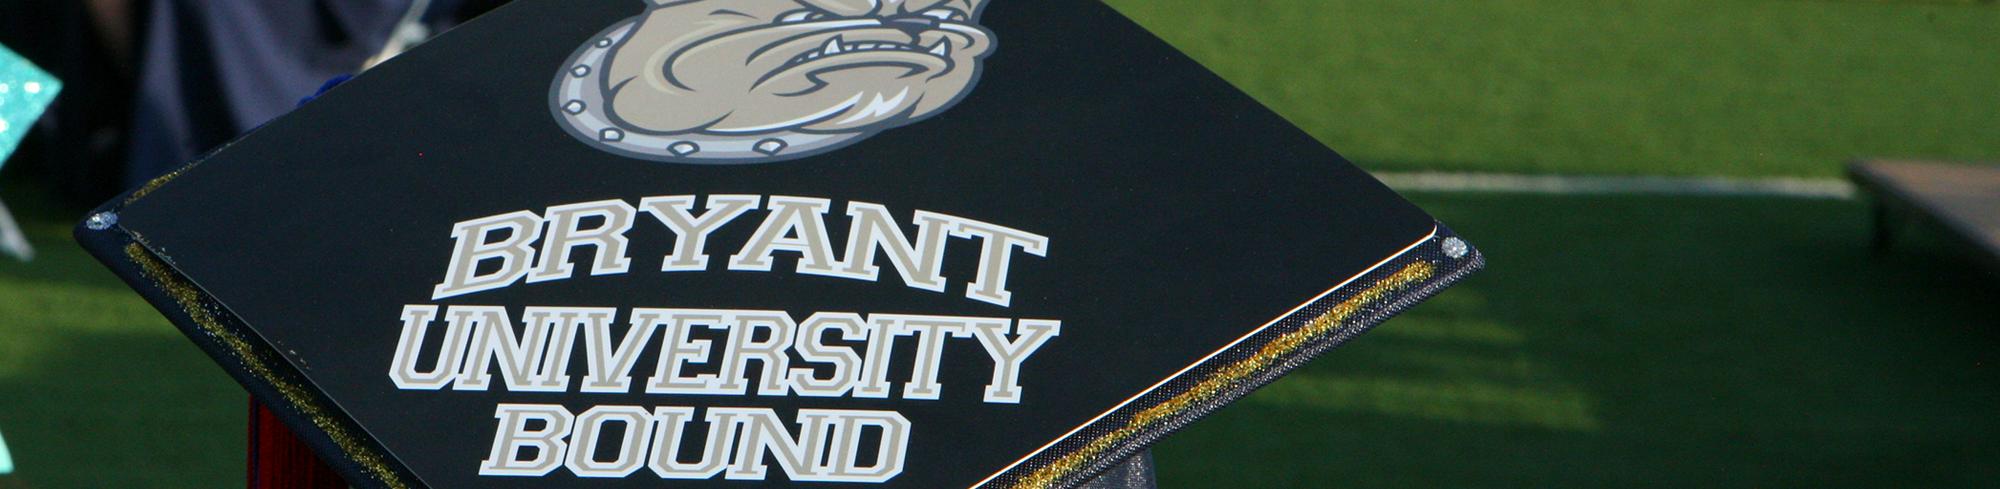 University Bound graduation cap